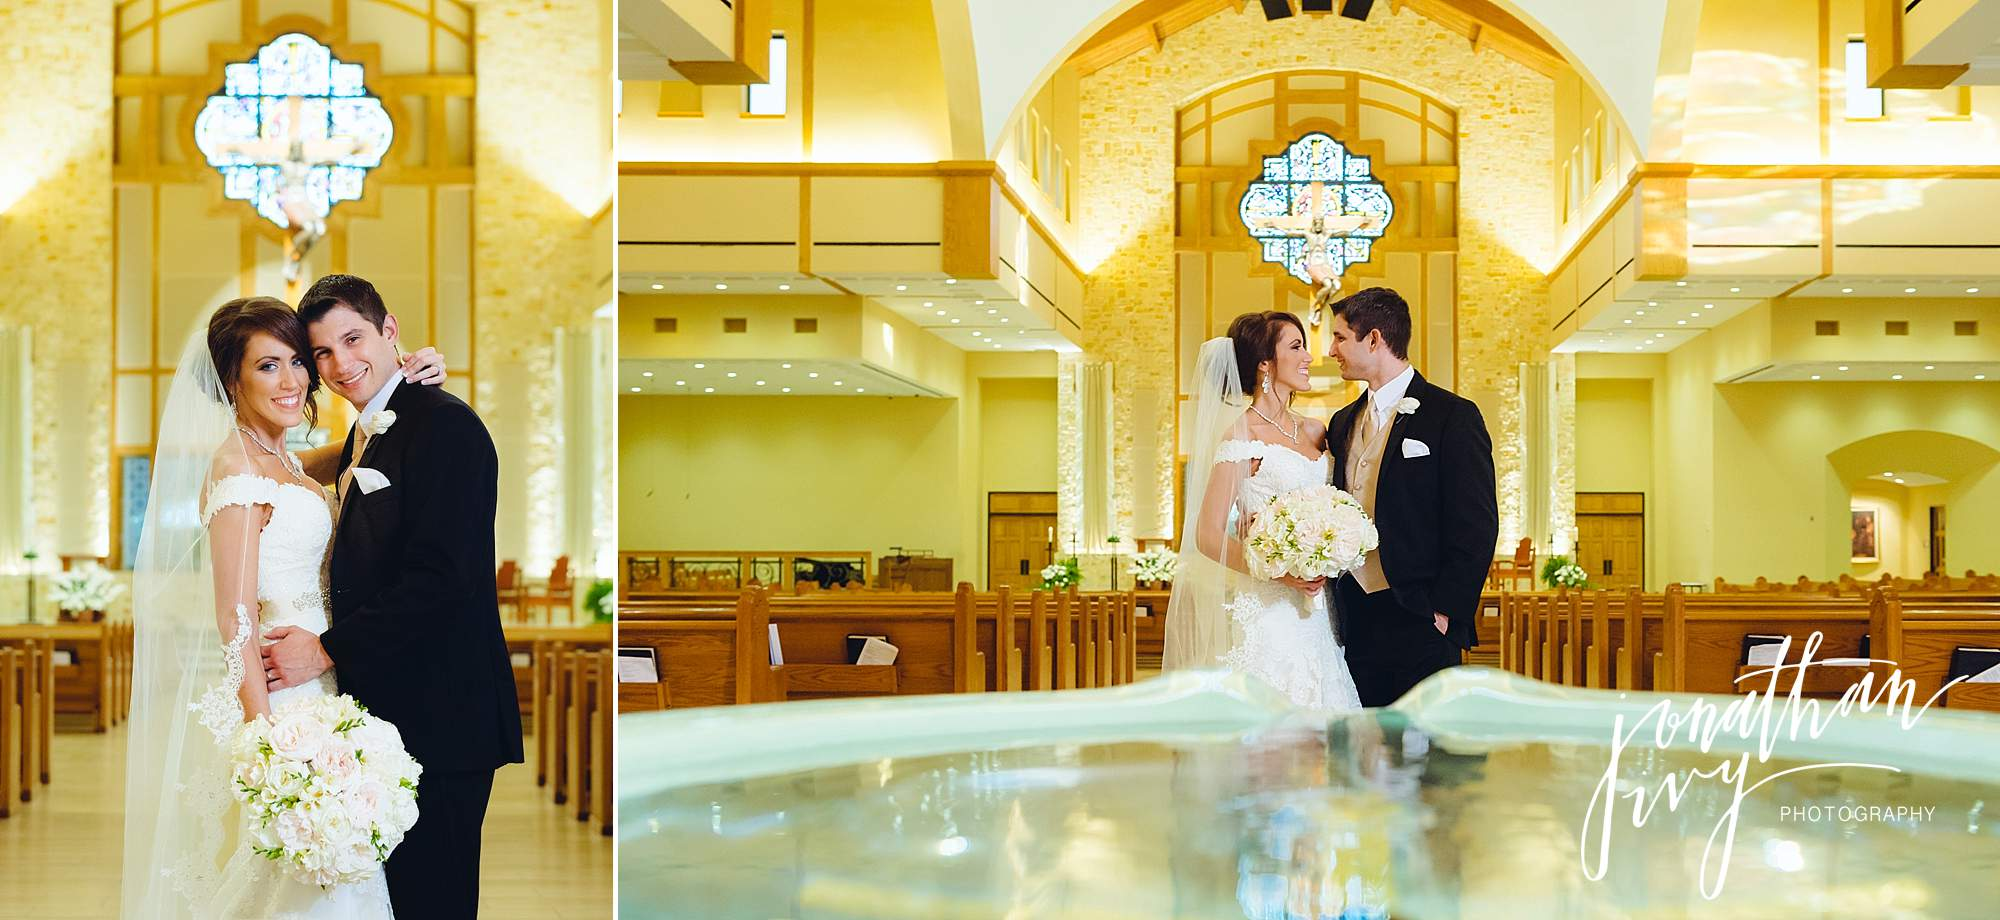 wedding at Christ the Redeemer Catholic Church Houston